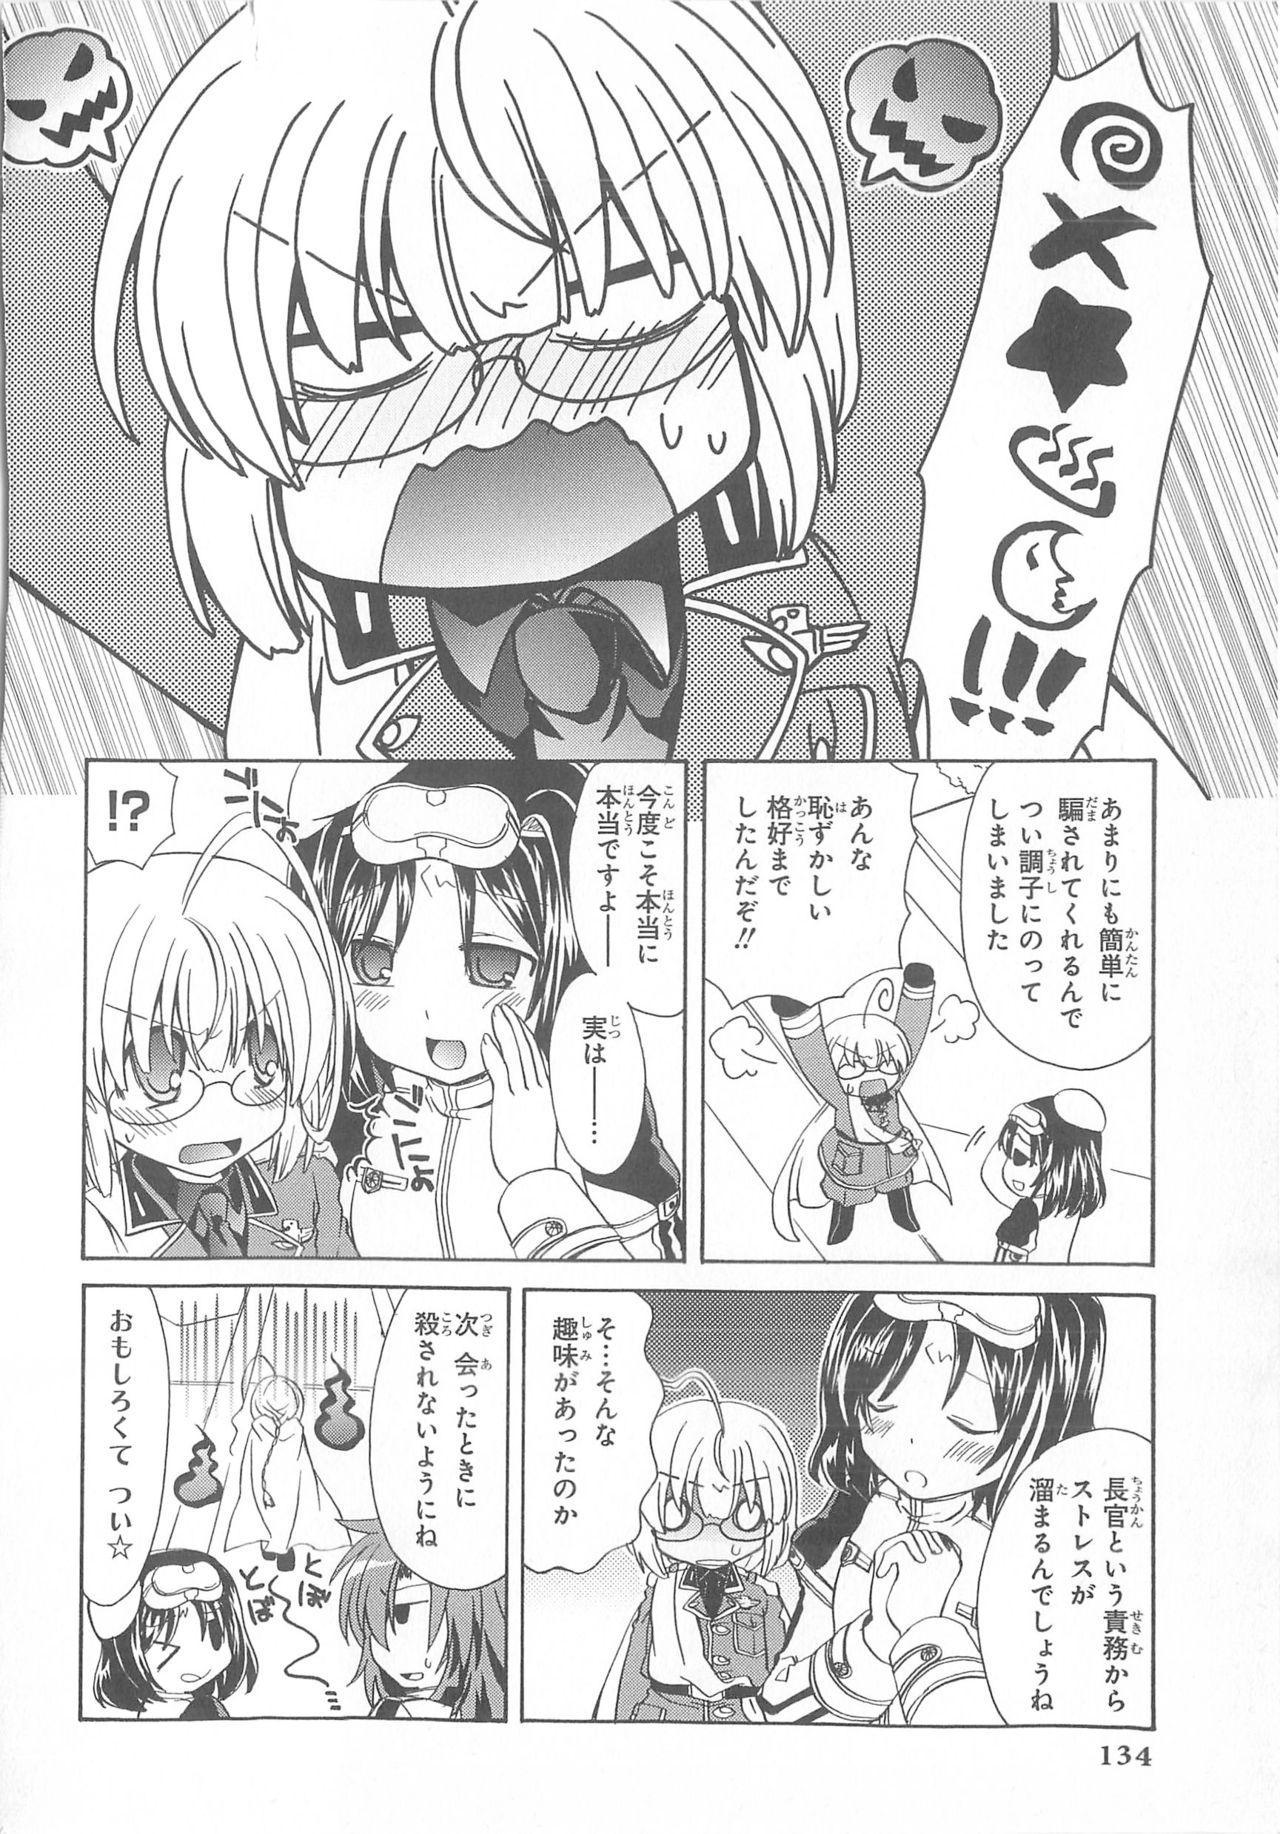 Daiteikoku comic Anthology vol.2 134